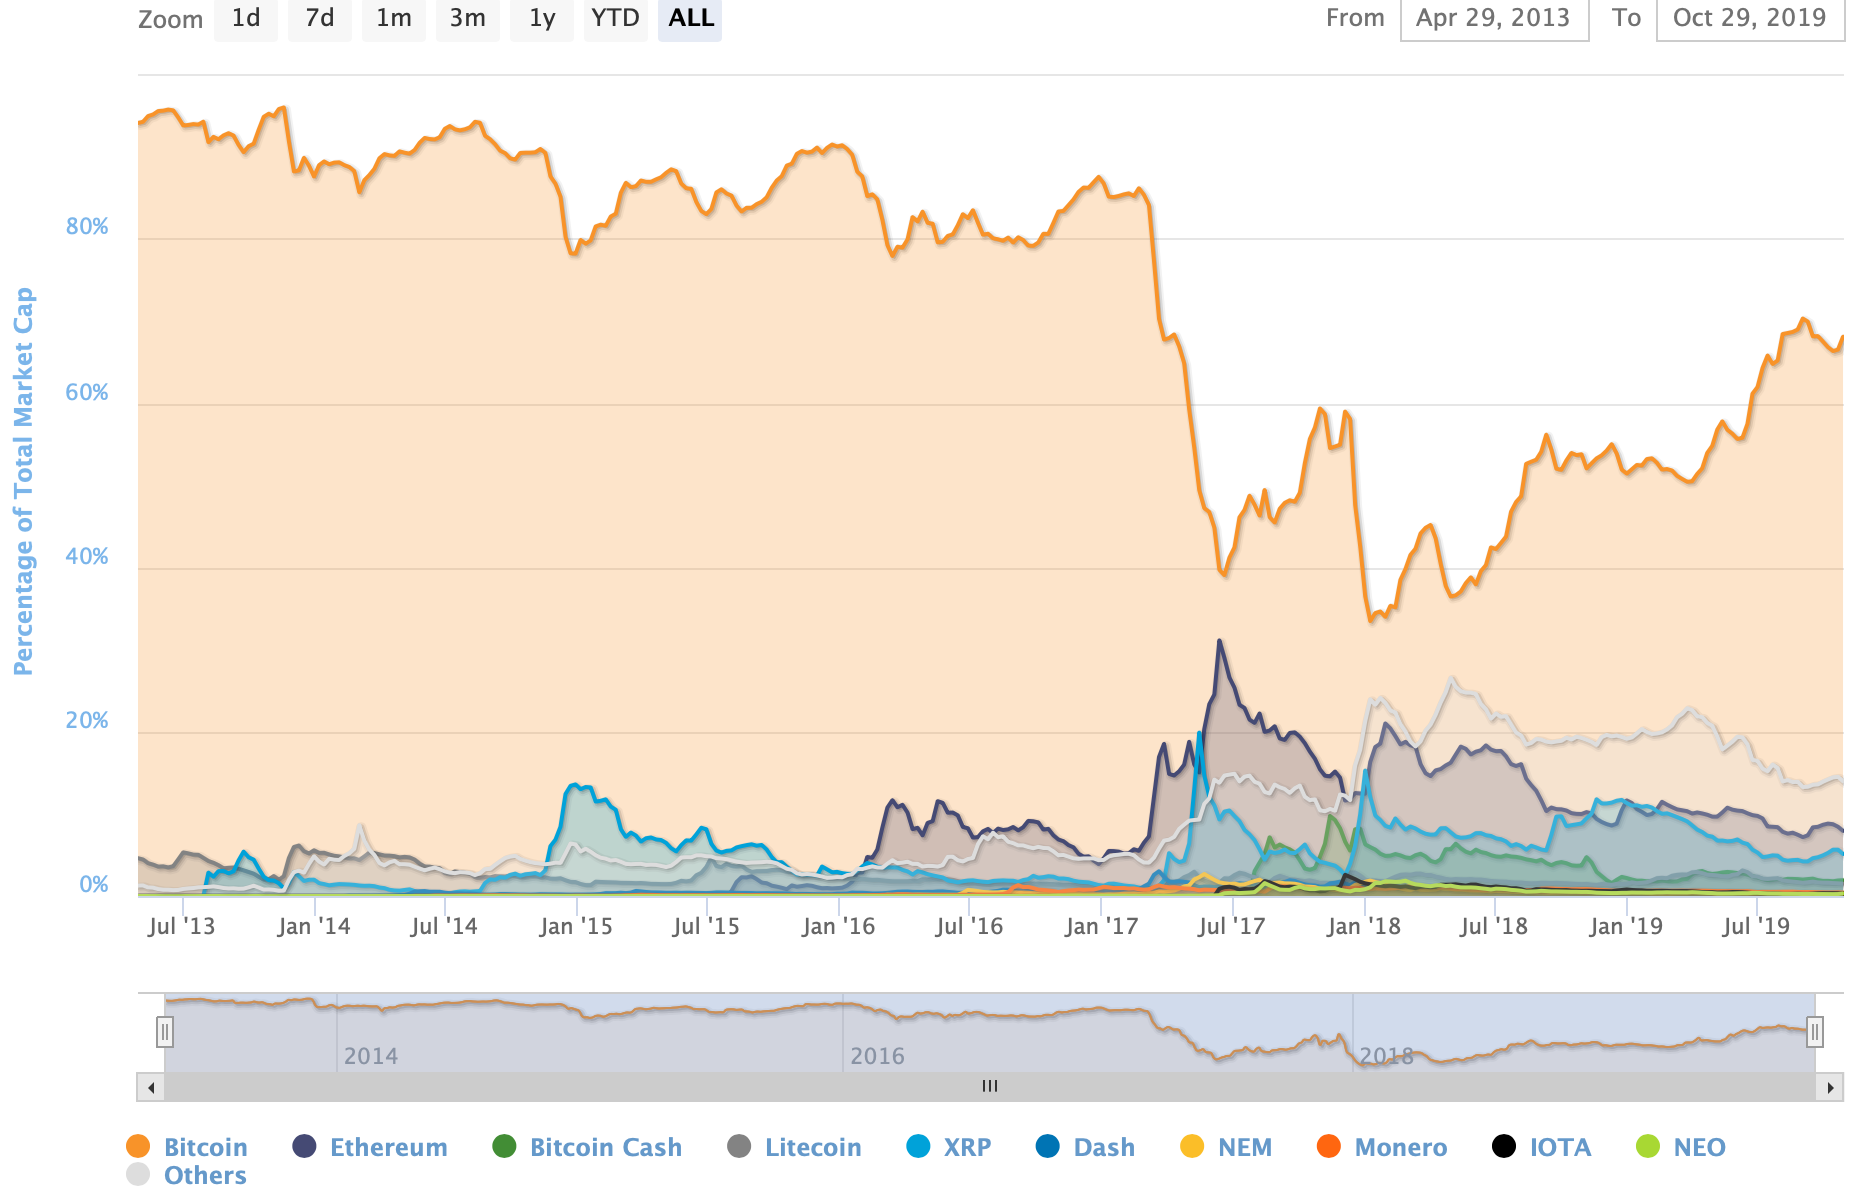 "La especulación abunda sobre la causa del reciente Rally de Bitcoin ""width ="" 1854 ""height = ""1186"" srcset = ""https://blackswanfinances.com/wp-content/uploads/2019/10/screen-shot-2019-10-29-at-9-22-20.png 1854w, https: / /news.bitcoin.com/wp-content/uploads/2019/10/screen-shot-2019-10-29-at-9-22-20-300x192.png 300w, https://news.bitcoin.com/ wp-content / uploads / 2019/10 / screen-shot-2019-10-29-at-9-22-20-768x491.png 768w, https://news.bitcoin.com/wp-content/uploads/2019 /10/screen-shot-2019-10-29-at-9-22-20-1024x655.png 1024w, https://news.bitcoin.com/wp-content/uploads/2019/10/screen-shot- 2019-10-29-at-9-22-20-696x445.png 696w, https://news.bitcoin.com/wp-content/uploads/2019/10/screen-shot-2019-10-29-at -9-22-20-1392x890.png 1392w, https://news.bitcoin.com/wp-content/uploads/2019/10/screen-shot-2019-10-29-at-9-22-20- 1068x683.png 106 8w, https://news.bitcoin.com/wp-content/uploads/2019/10/screen-shot-2019-10-29-at-9-22-20-657x420.png 657w ""tamaños ="" (máx. -ancho: 1854px) 100vw, 1854px"